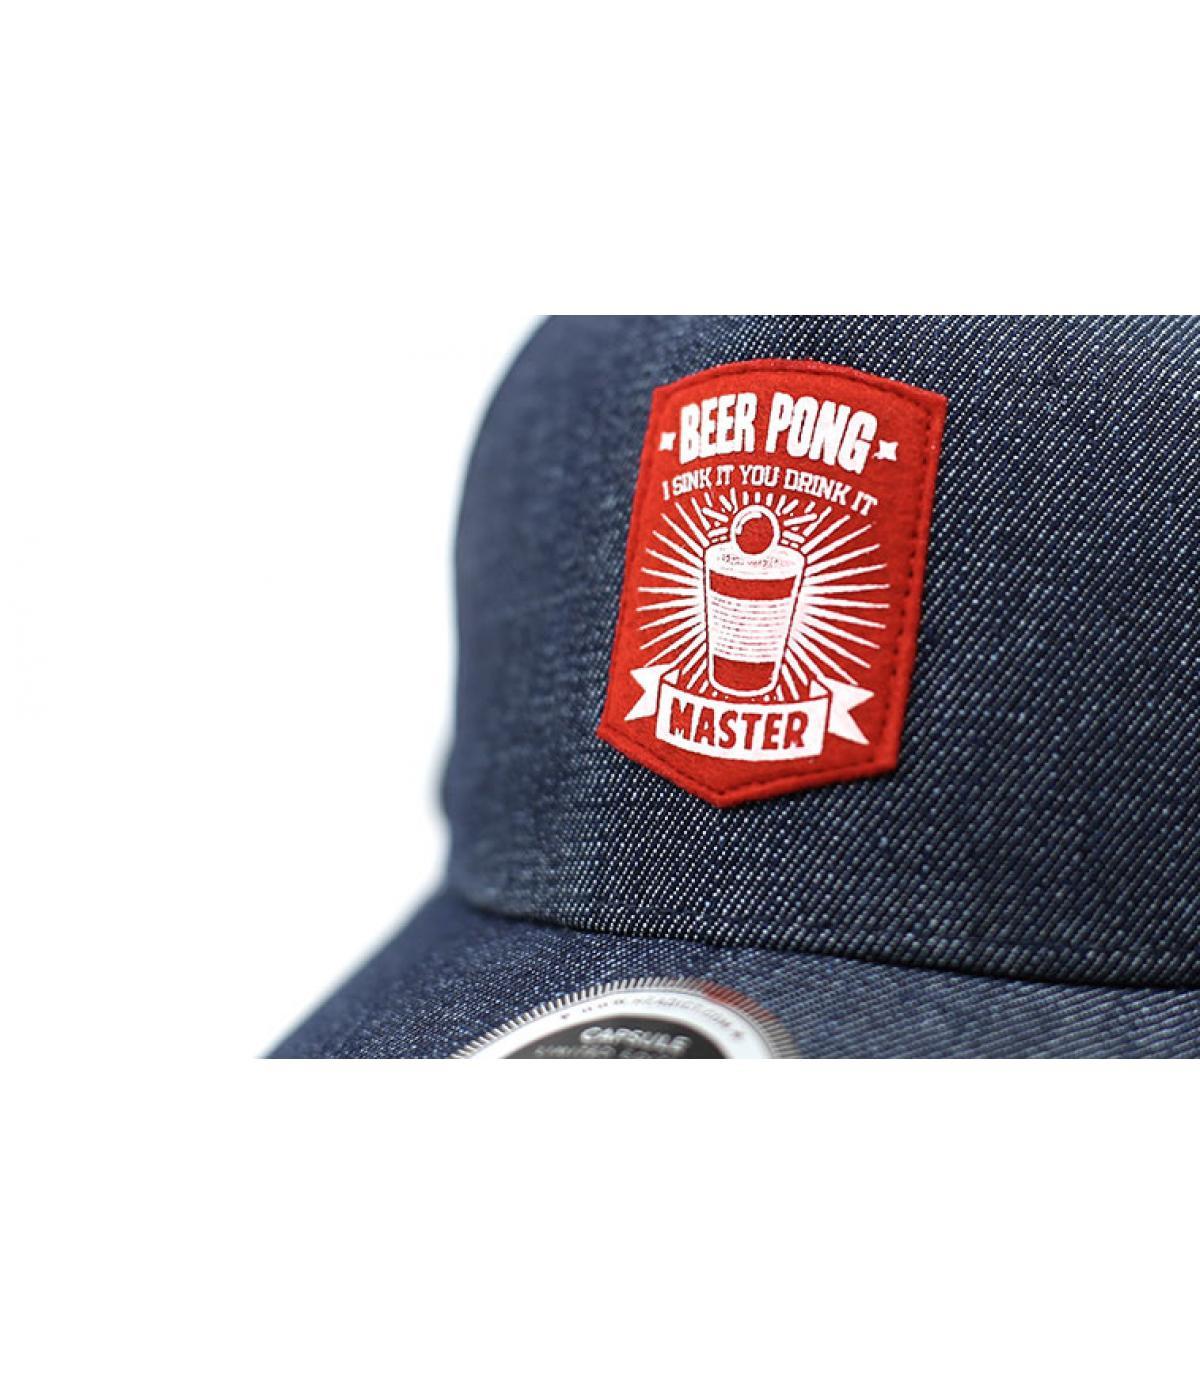 Details Trucker Beer Pong Master - afbeeling 3